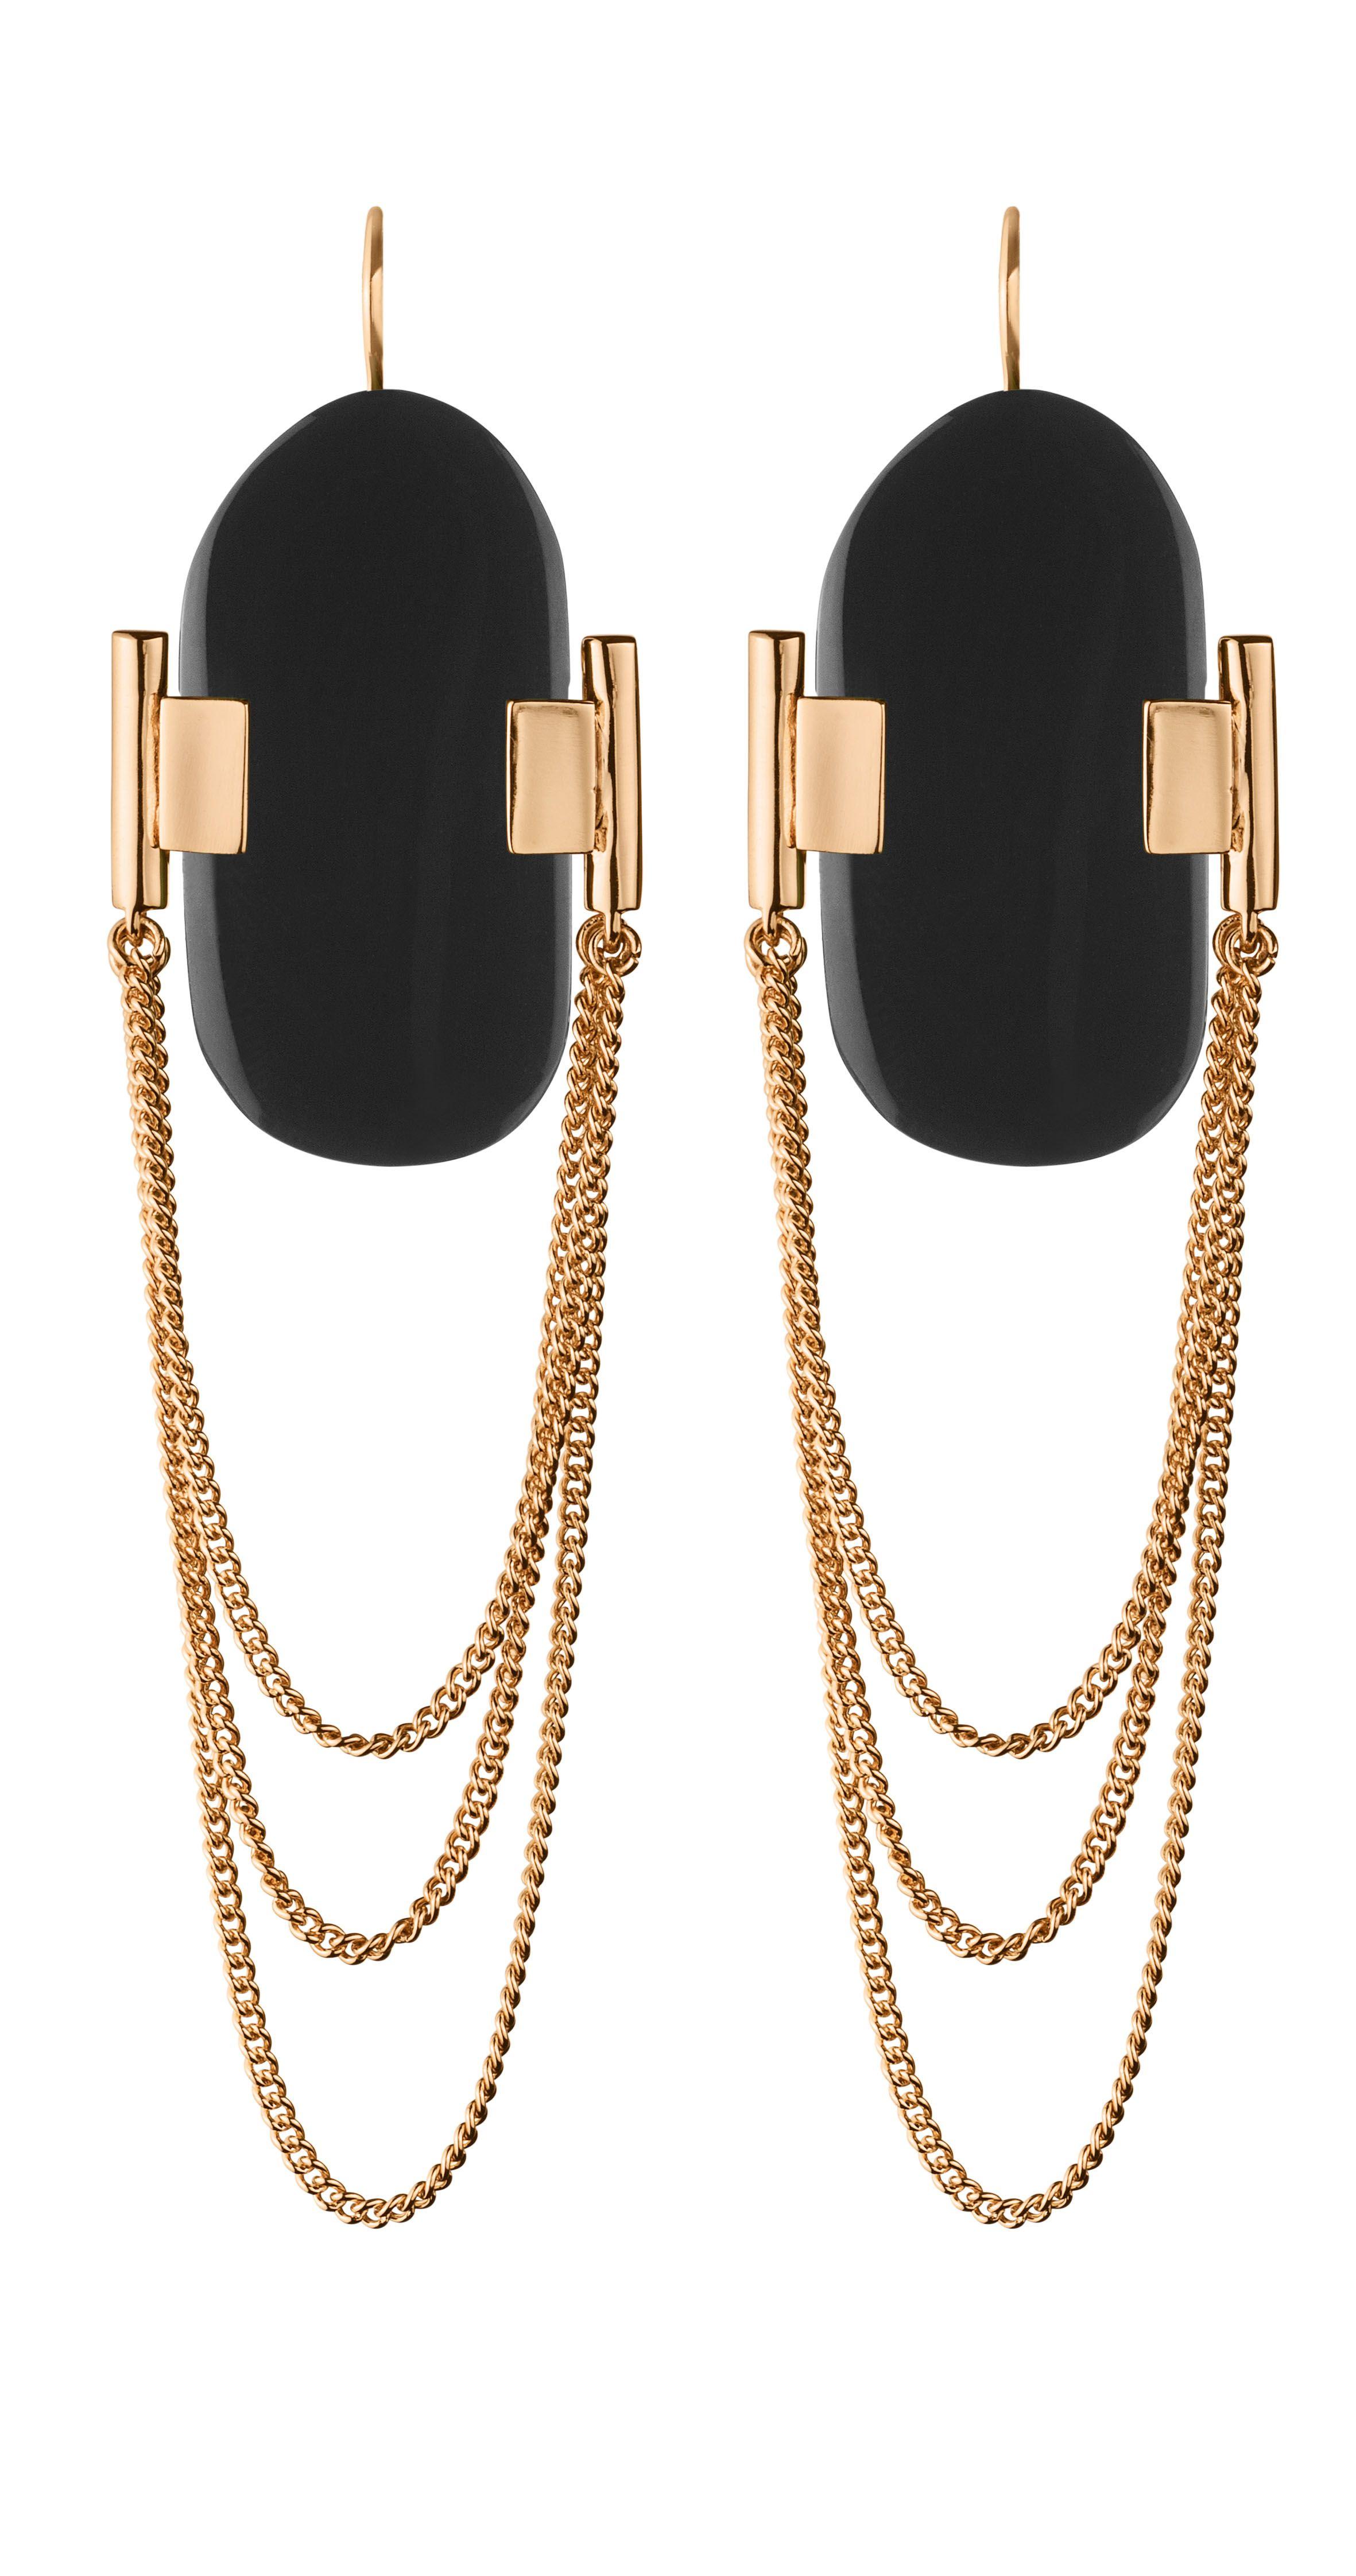 GENARO RG BLACK danish jewelry style fashion rosegold black